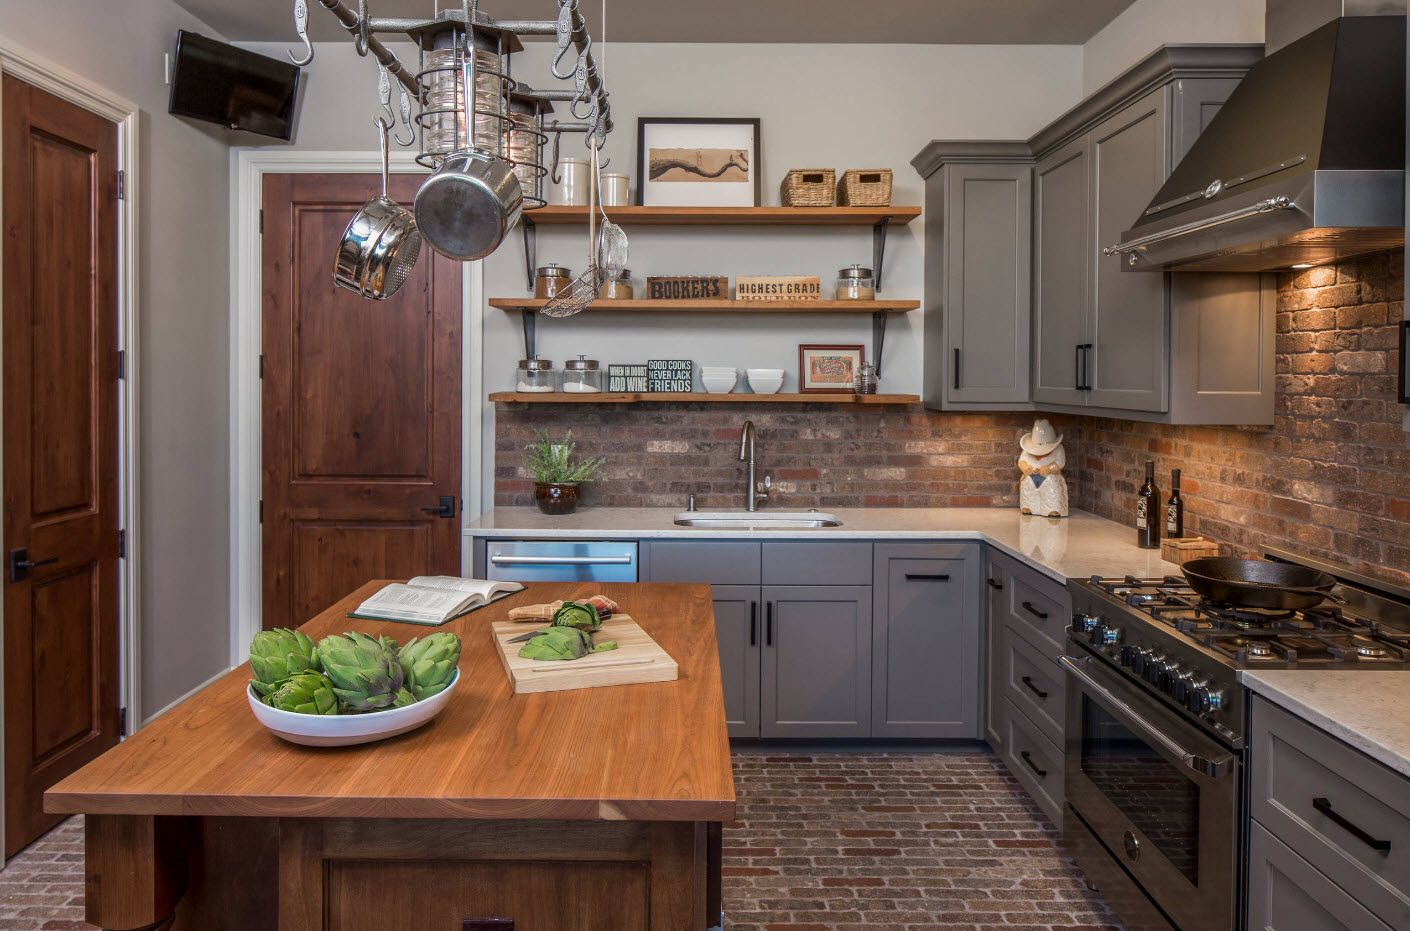 Дерево, кирпич и плитка в серой кухне